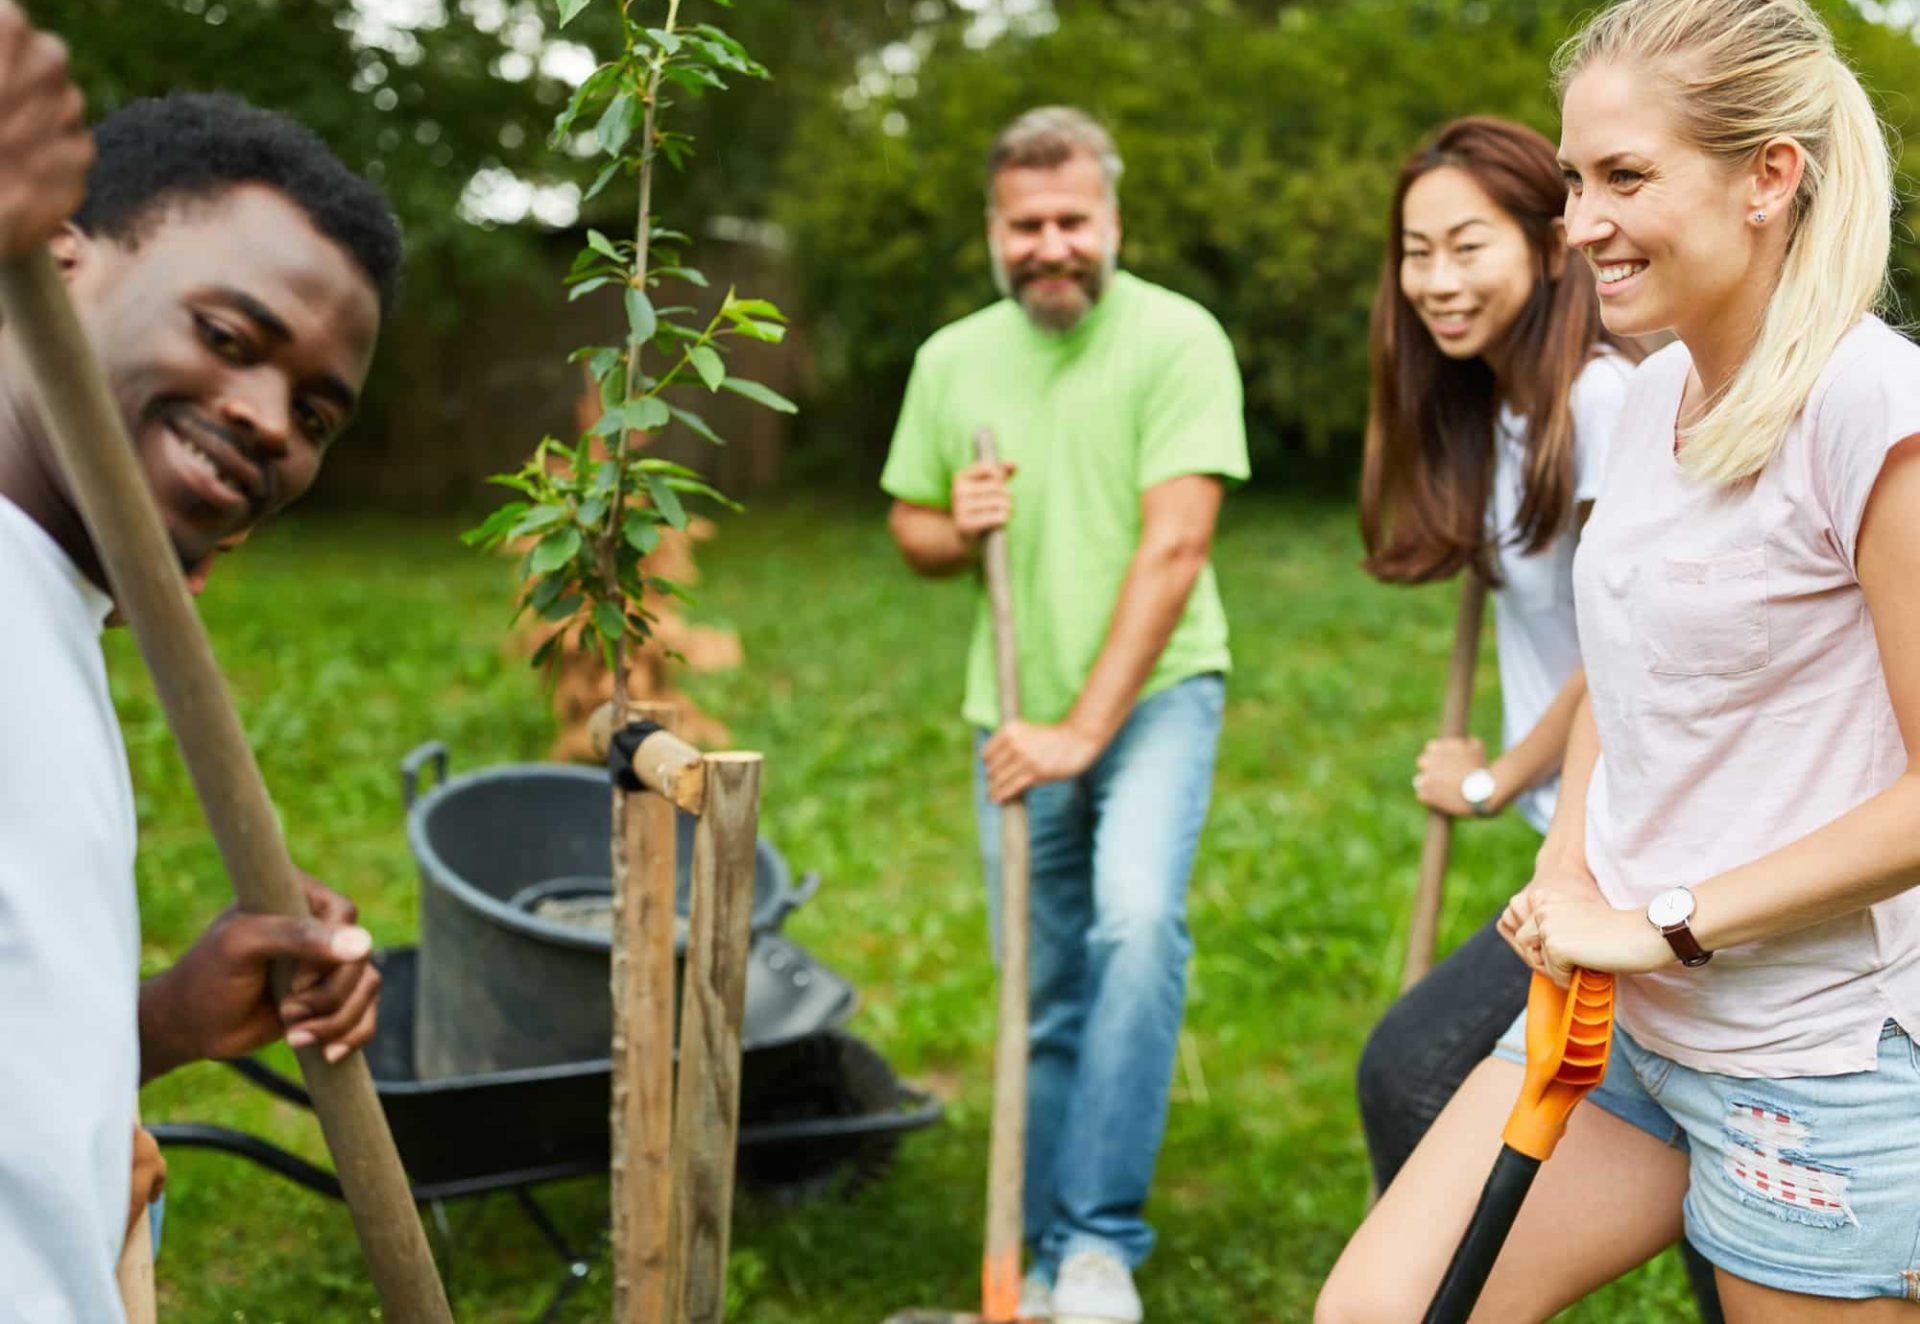 shutterstockteam-volunteer-plants-tree-together-park_1440961073